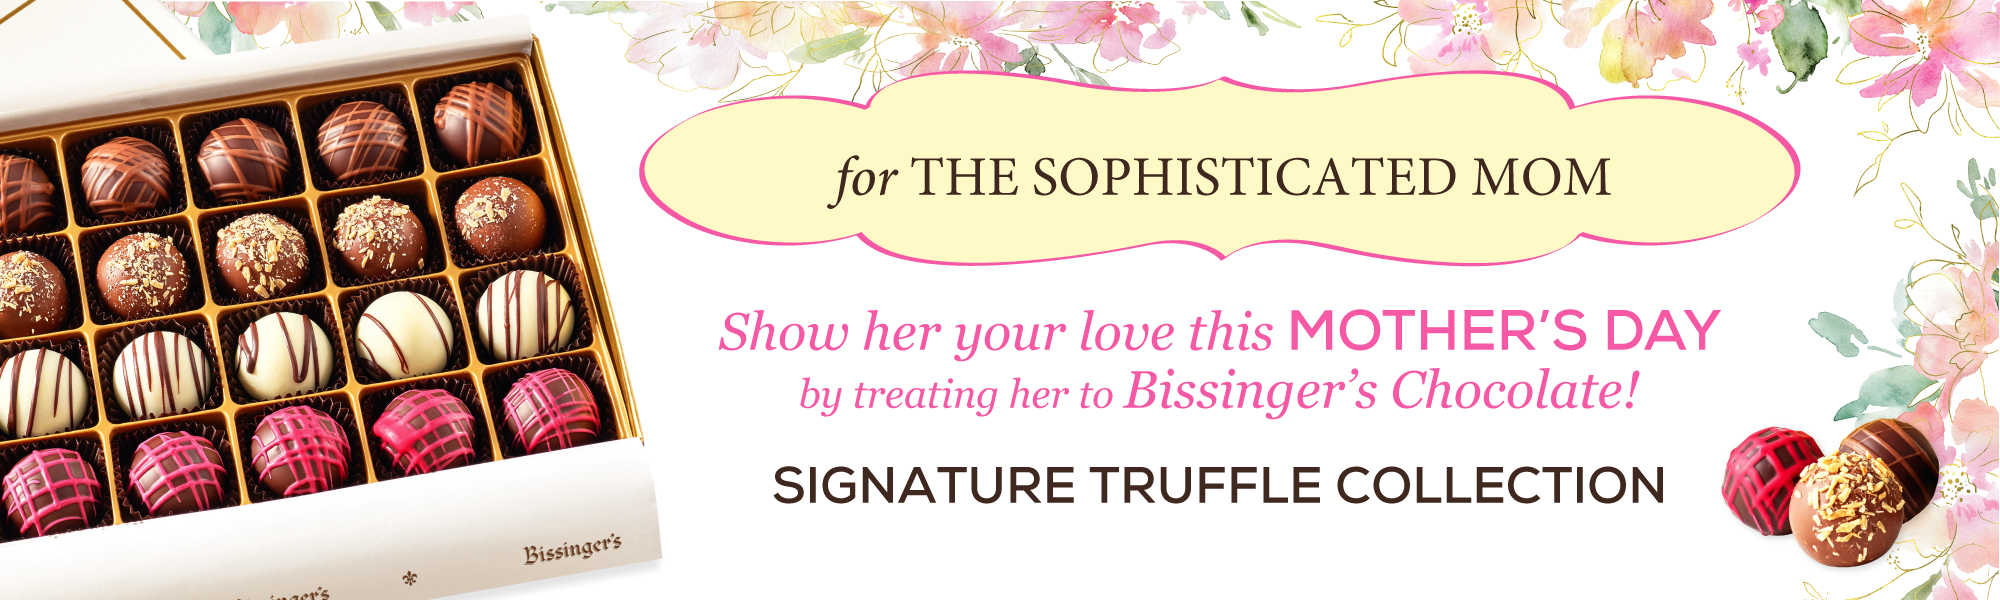 Signature Truffle Collection